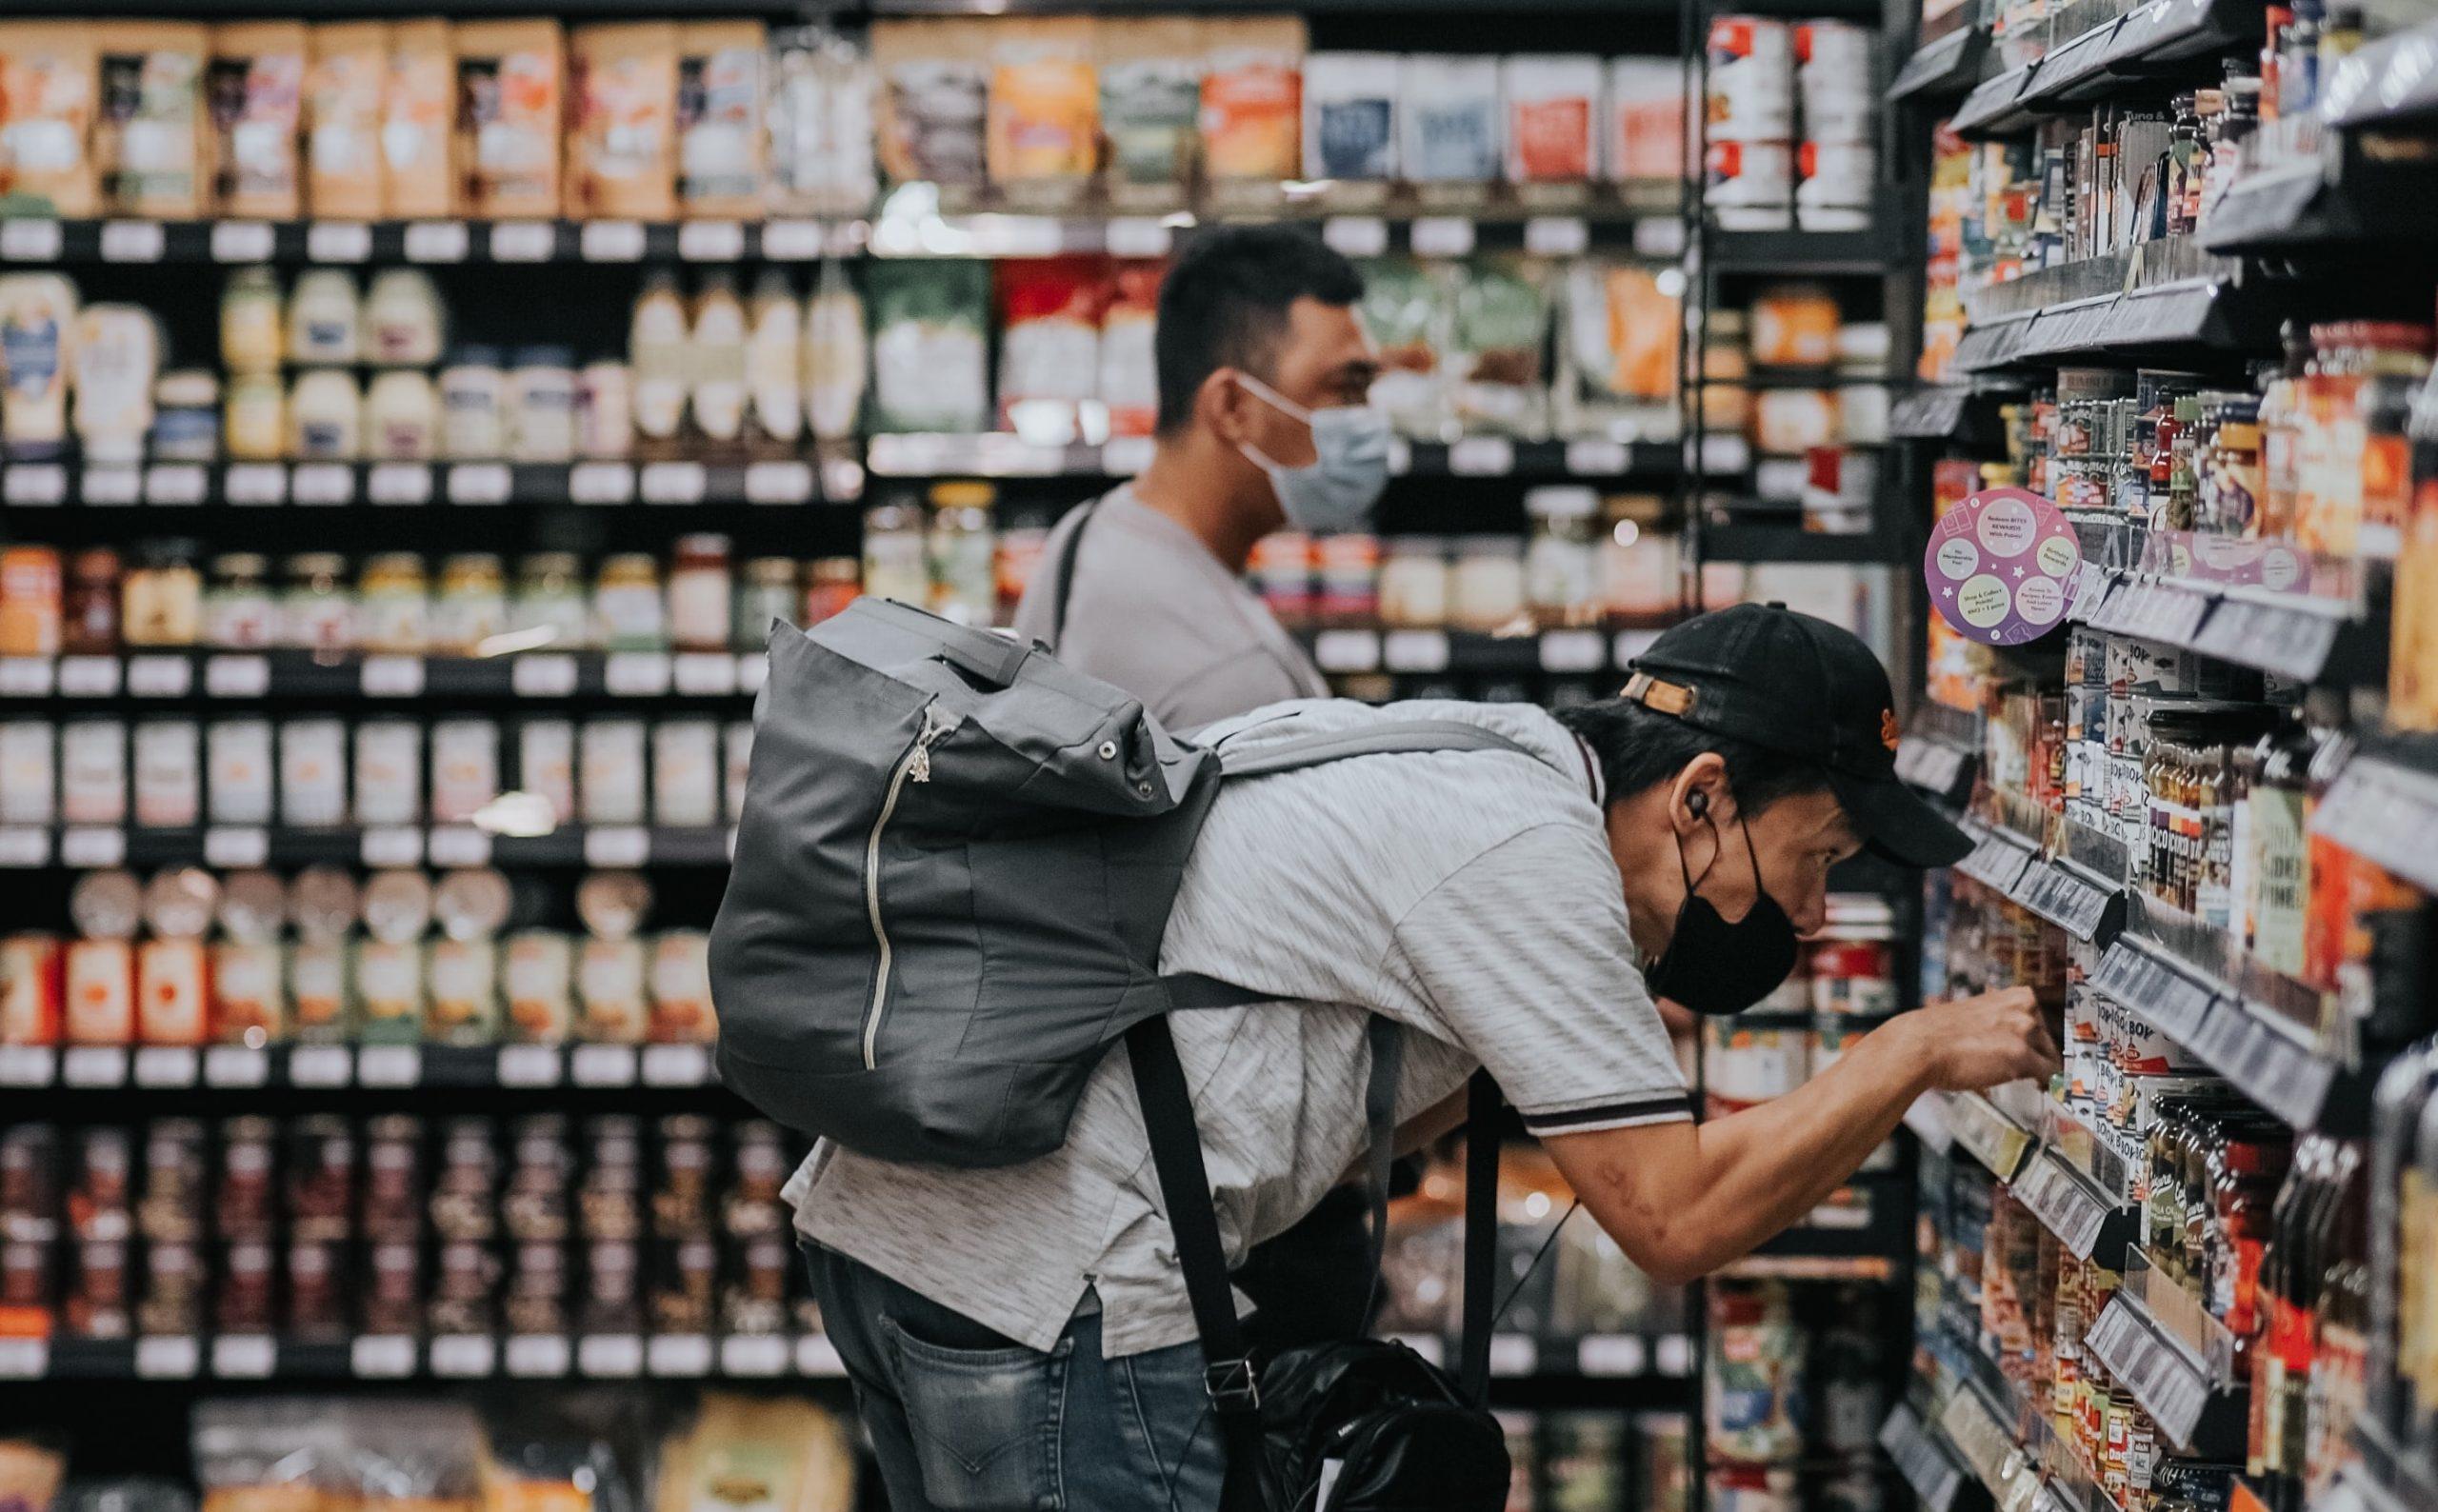 Man in supermarket inspecting shelf